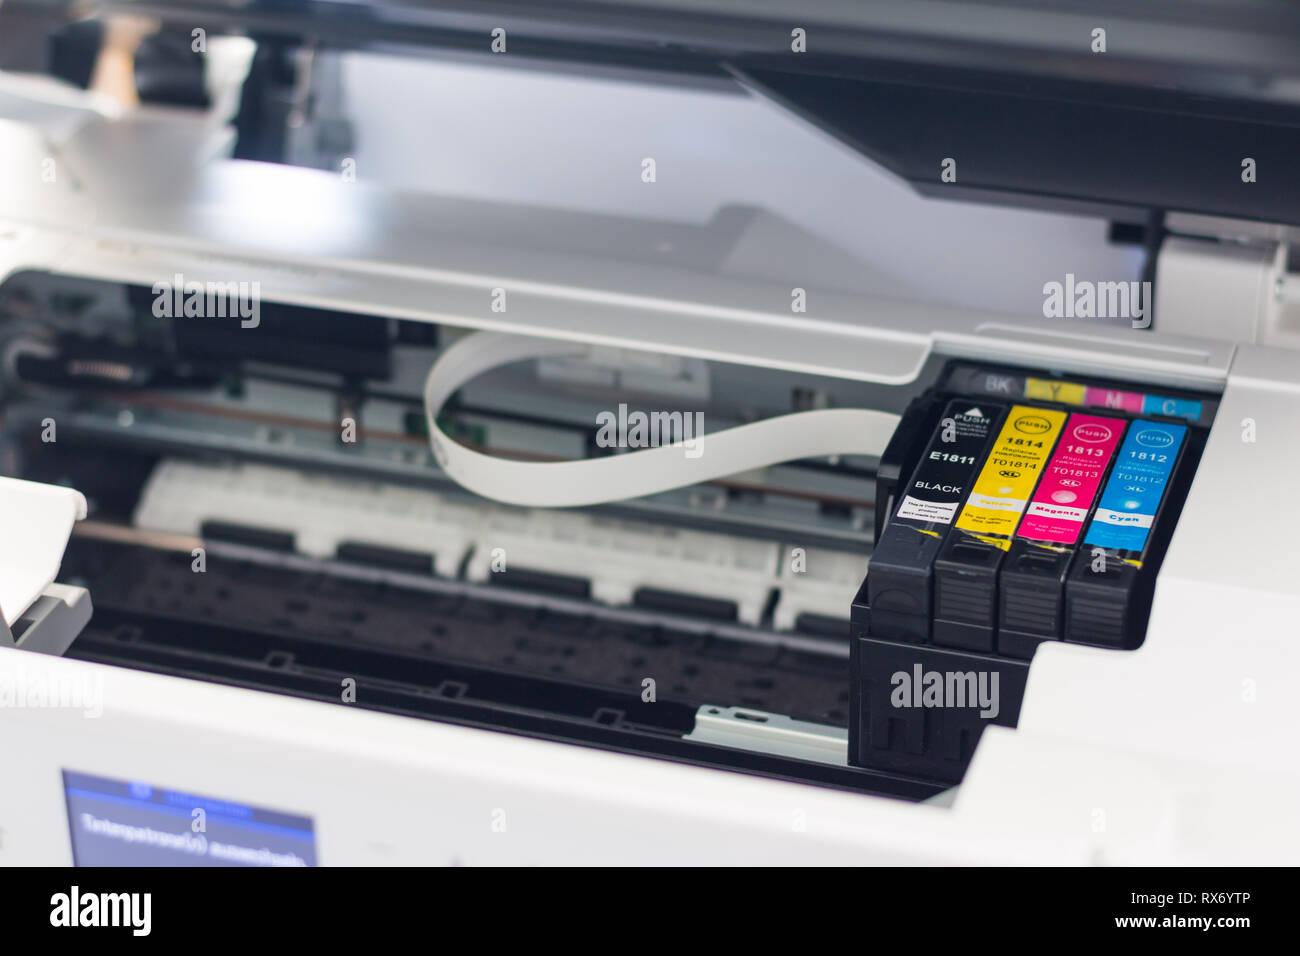 1f89ed9781f0 Printer Cartridge Stock Photos   Printer Cartridge Stock Images - Alamy